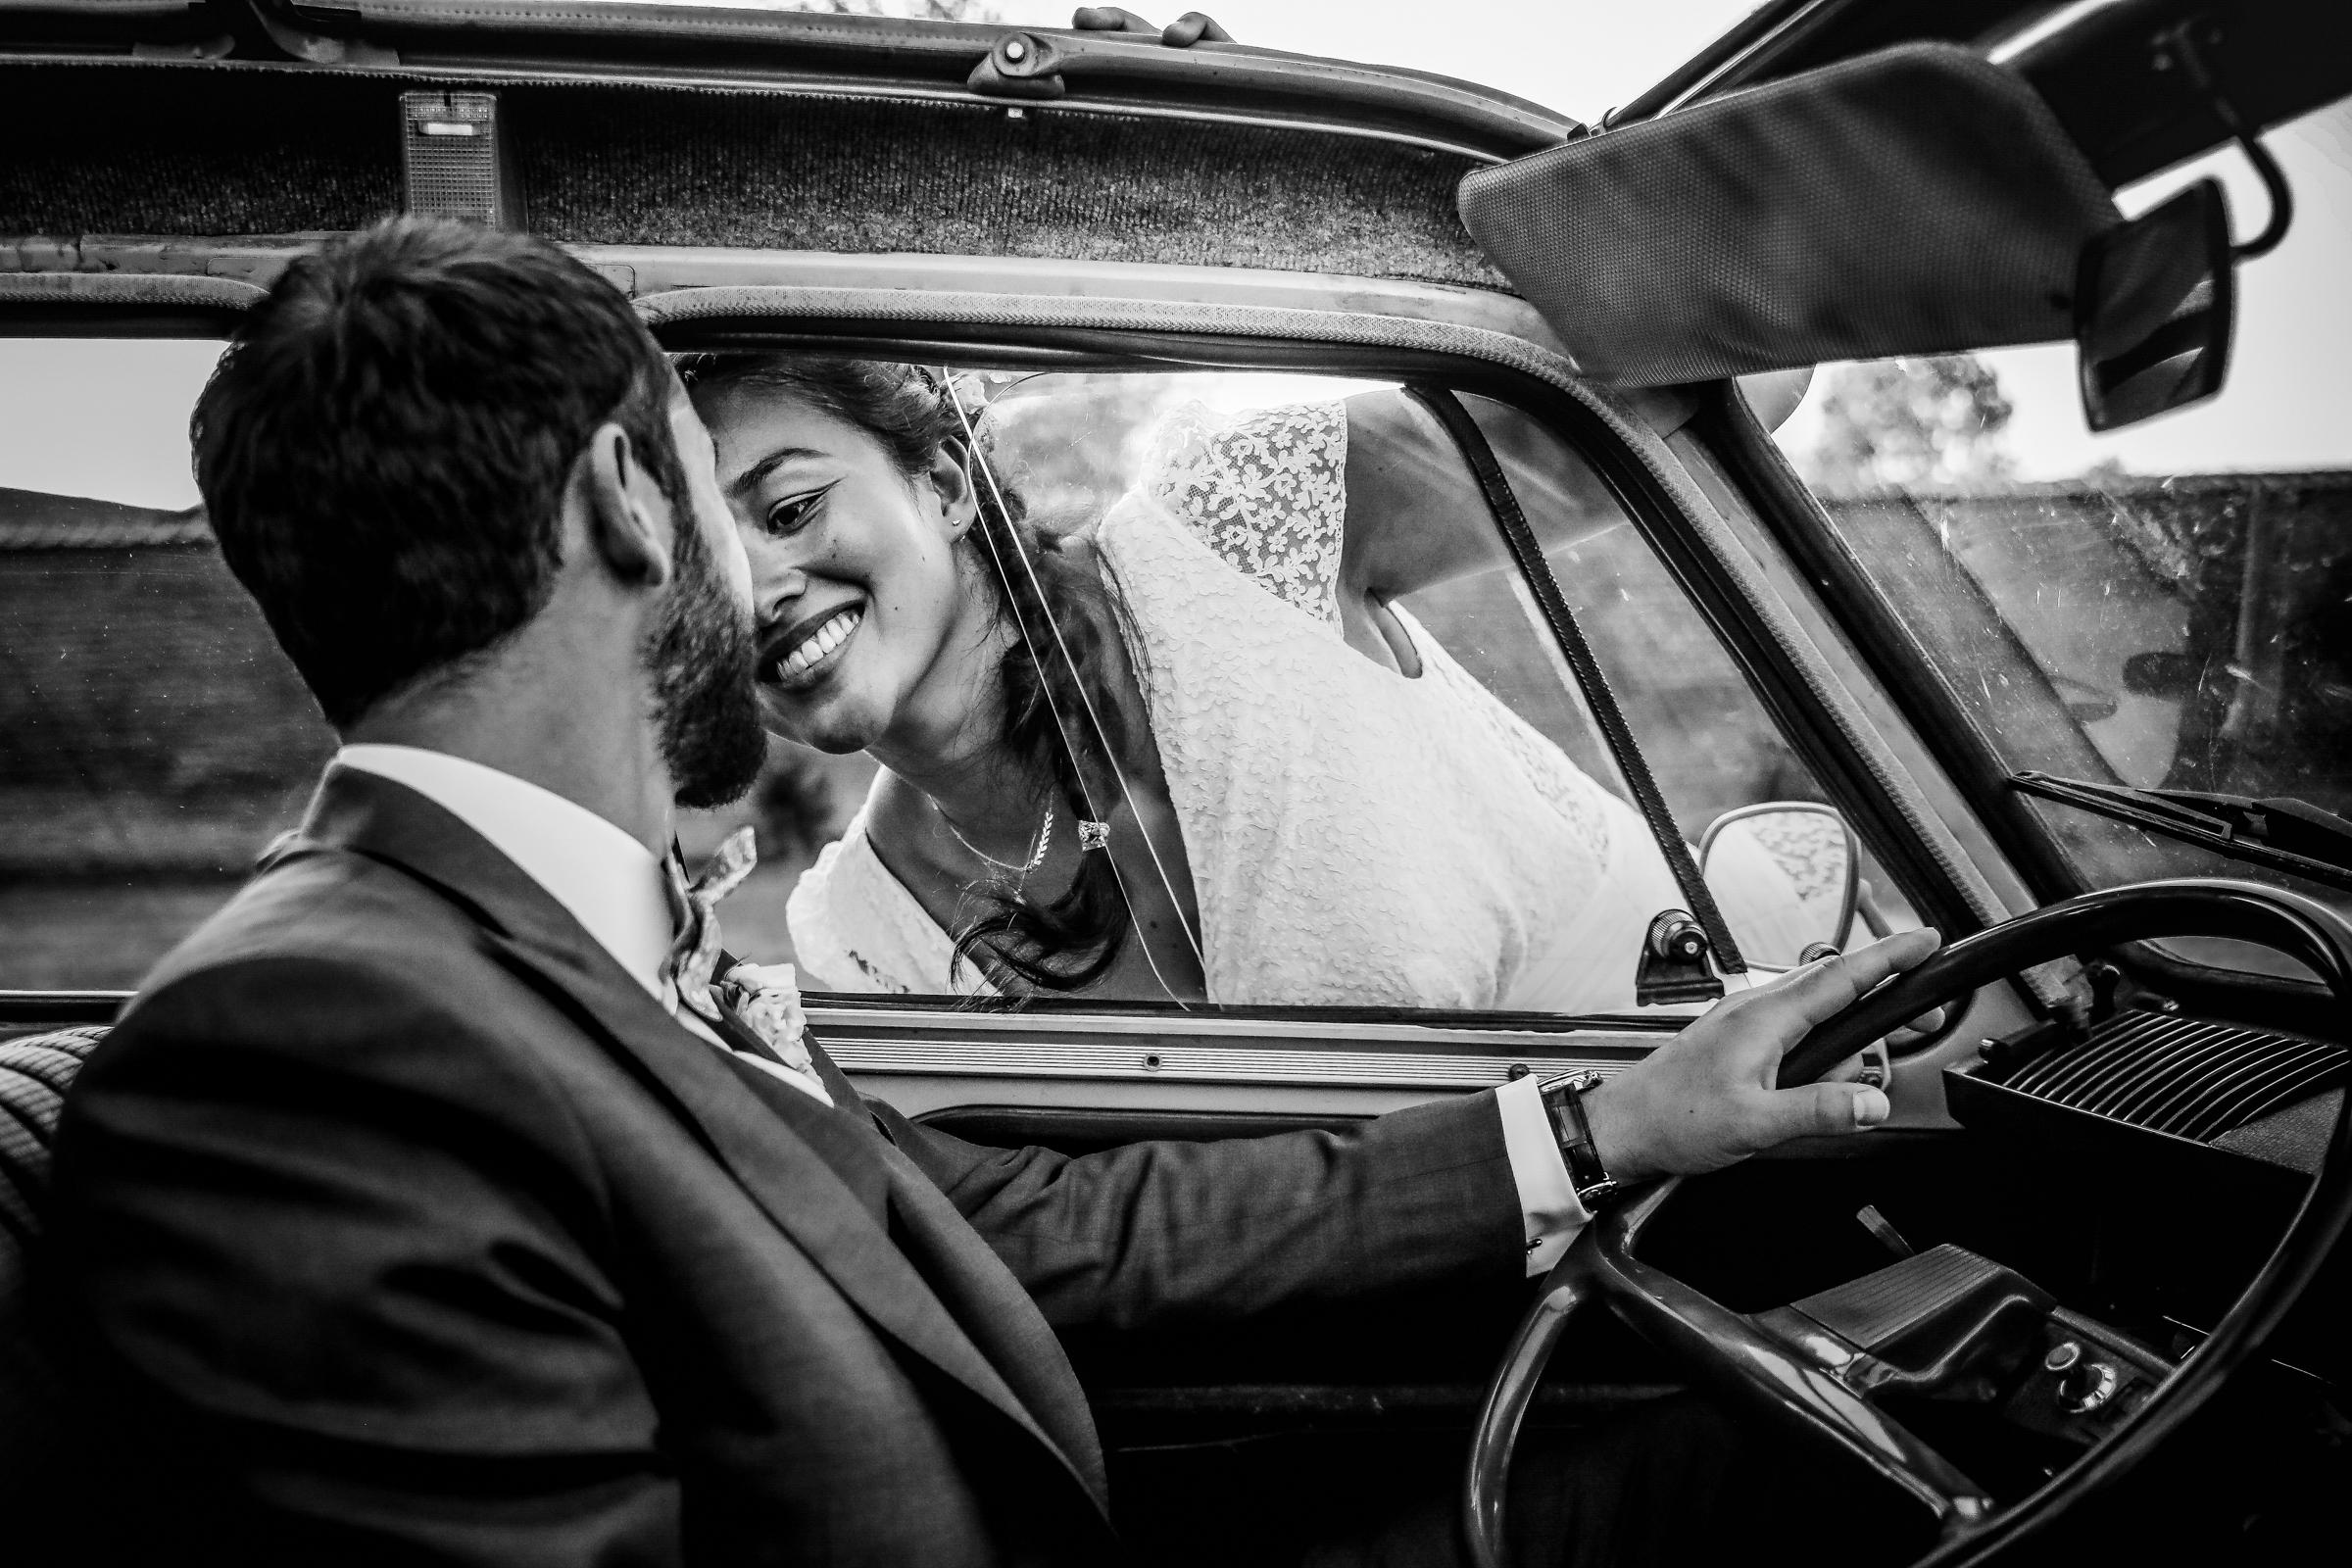 Smiling bride kisses groom through car window - photo by Julien Laurent-Georges